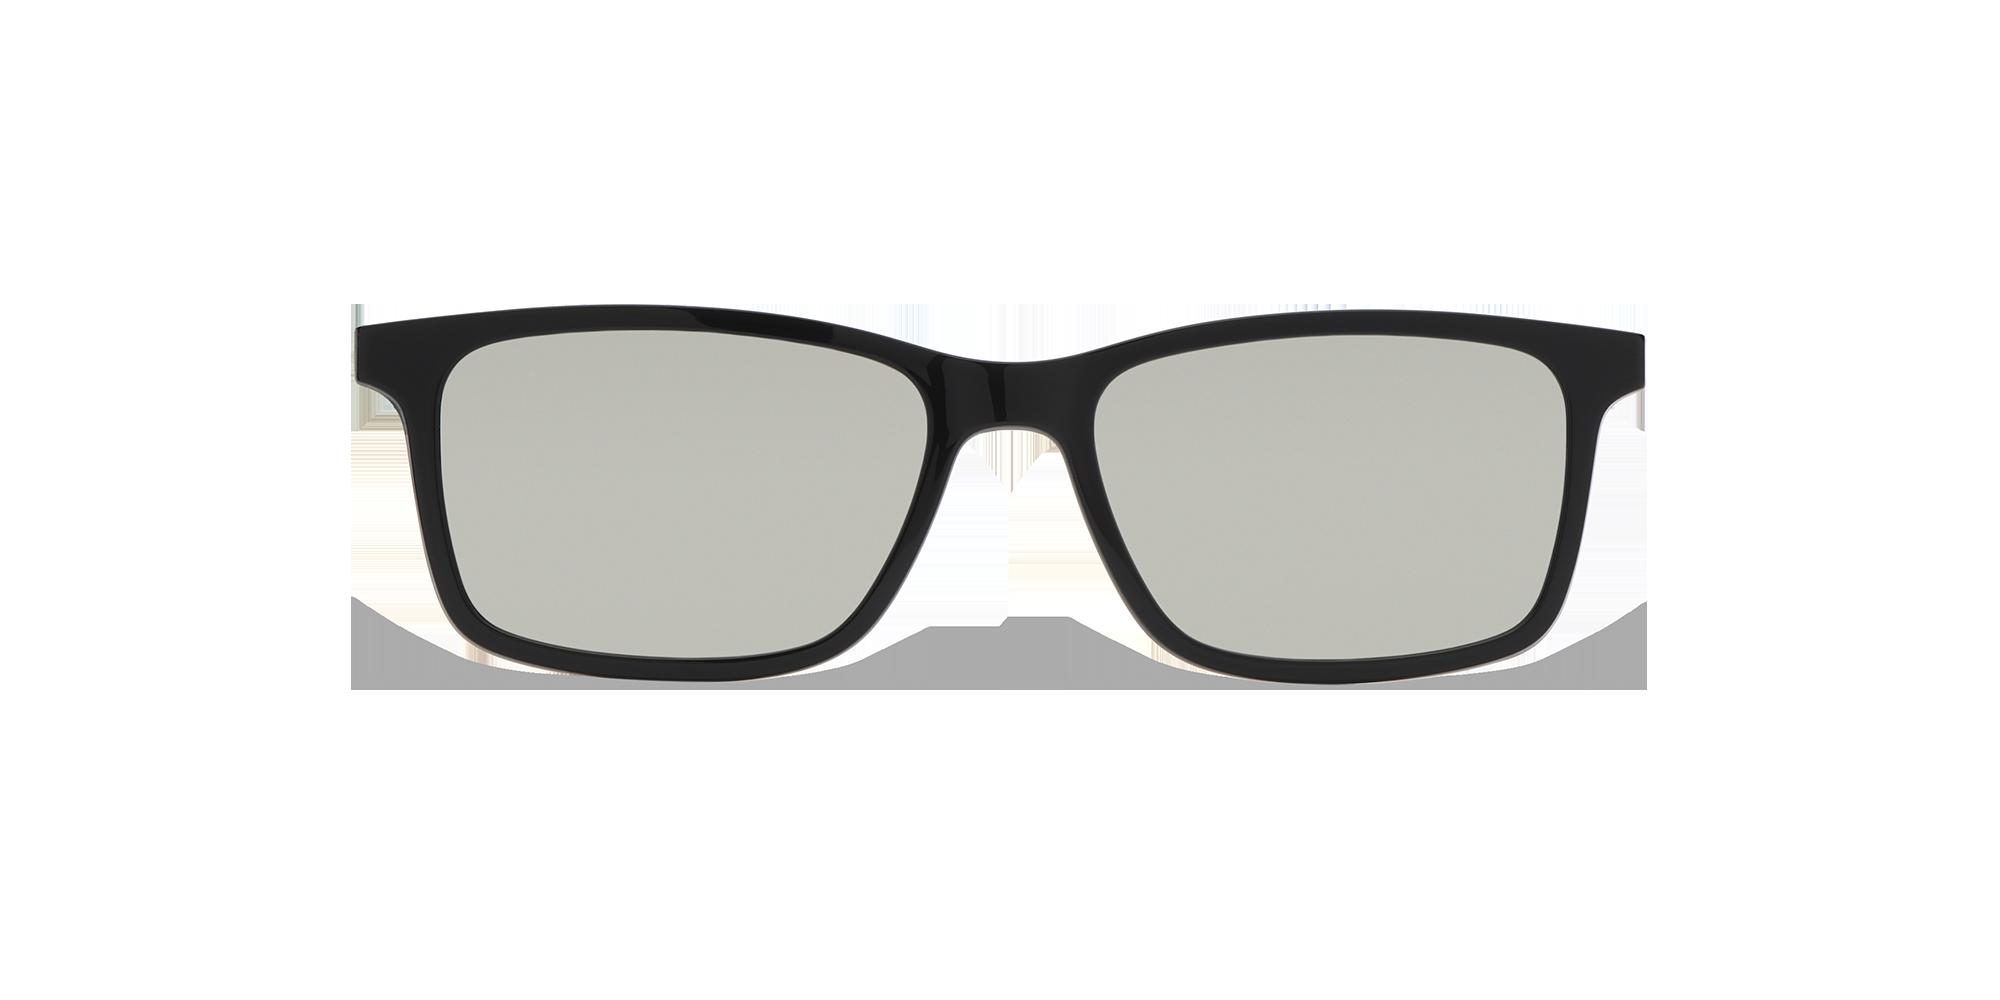 afflelou/france/products/smart_clip/clips_glasses/TMK32R3BK015316.png